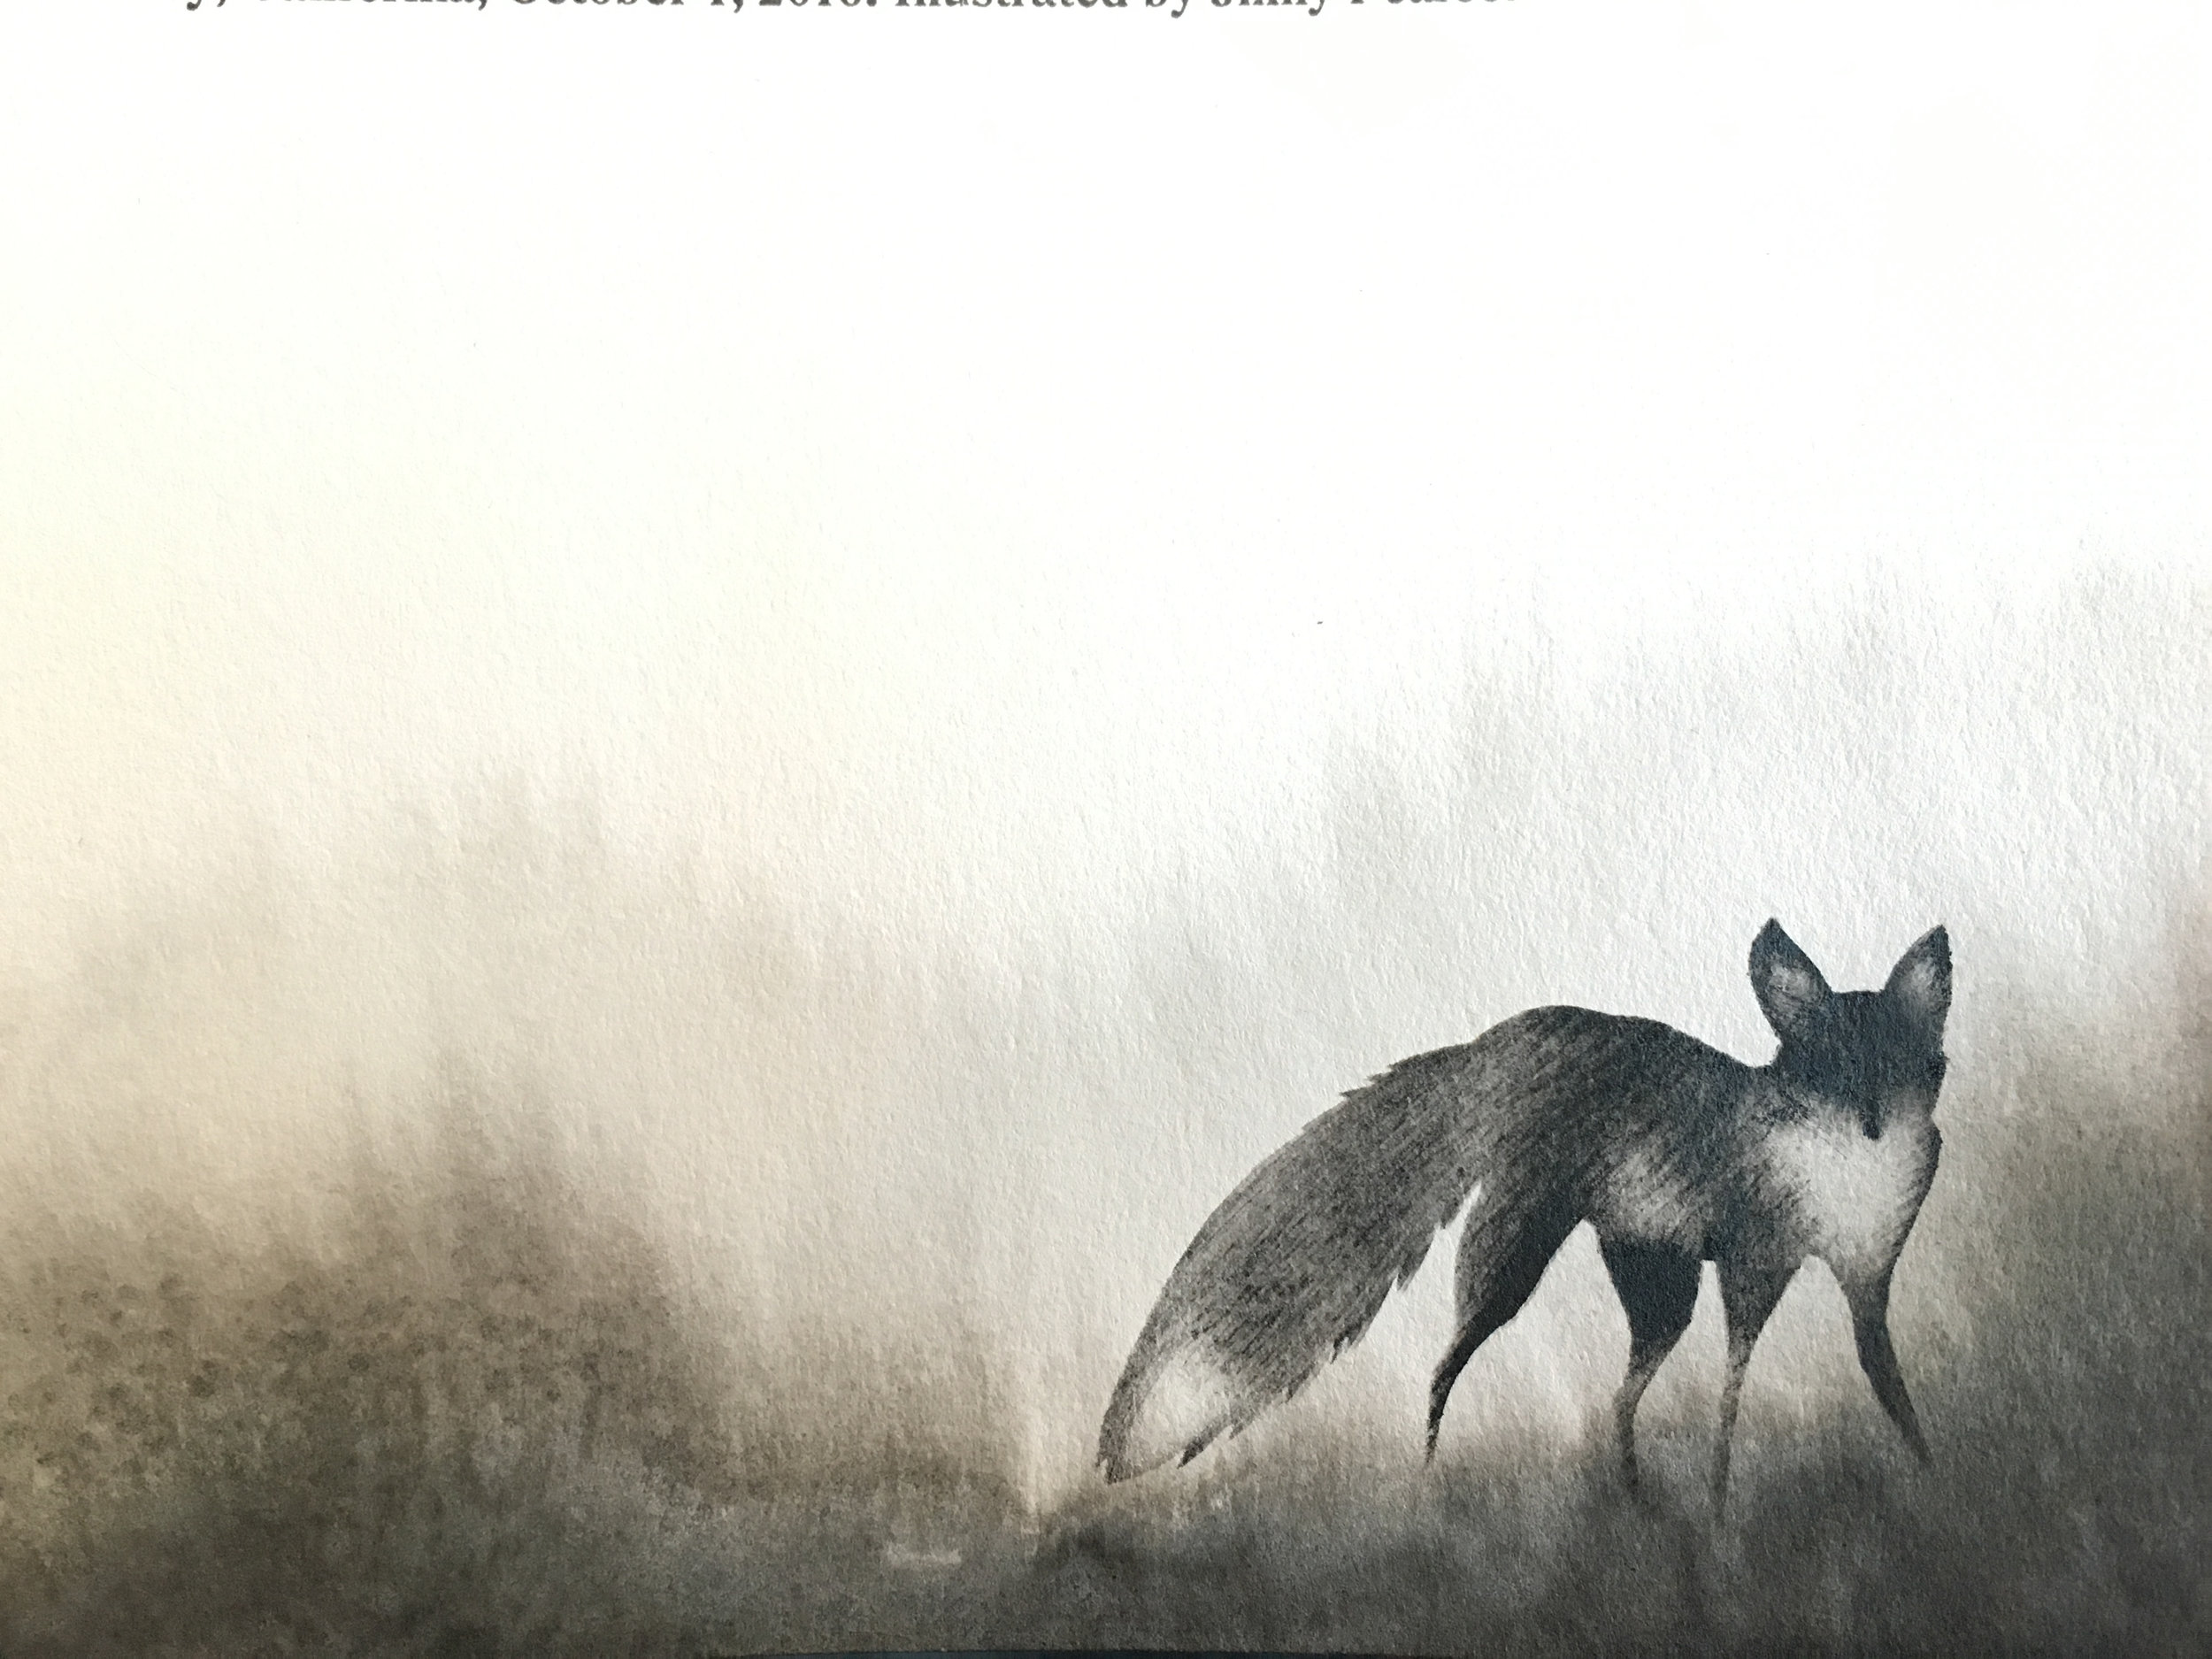 fox-detail.jpg